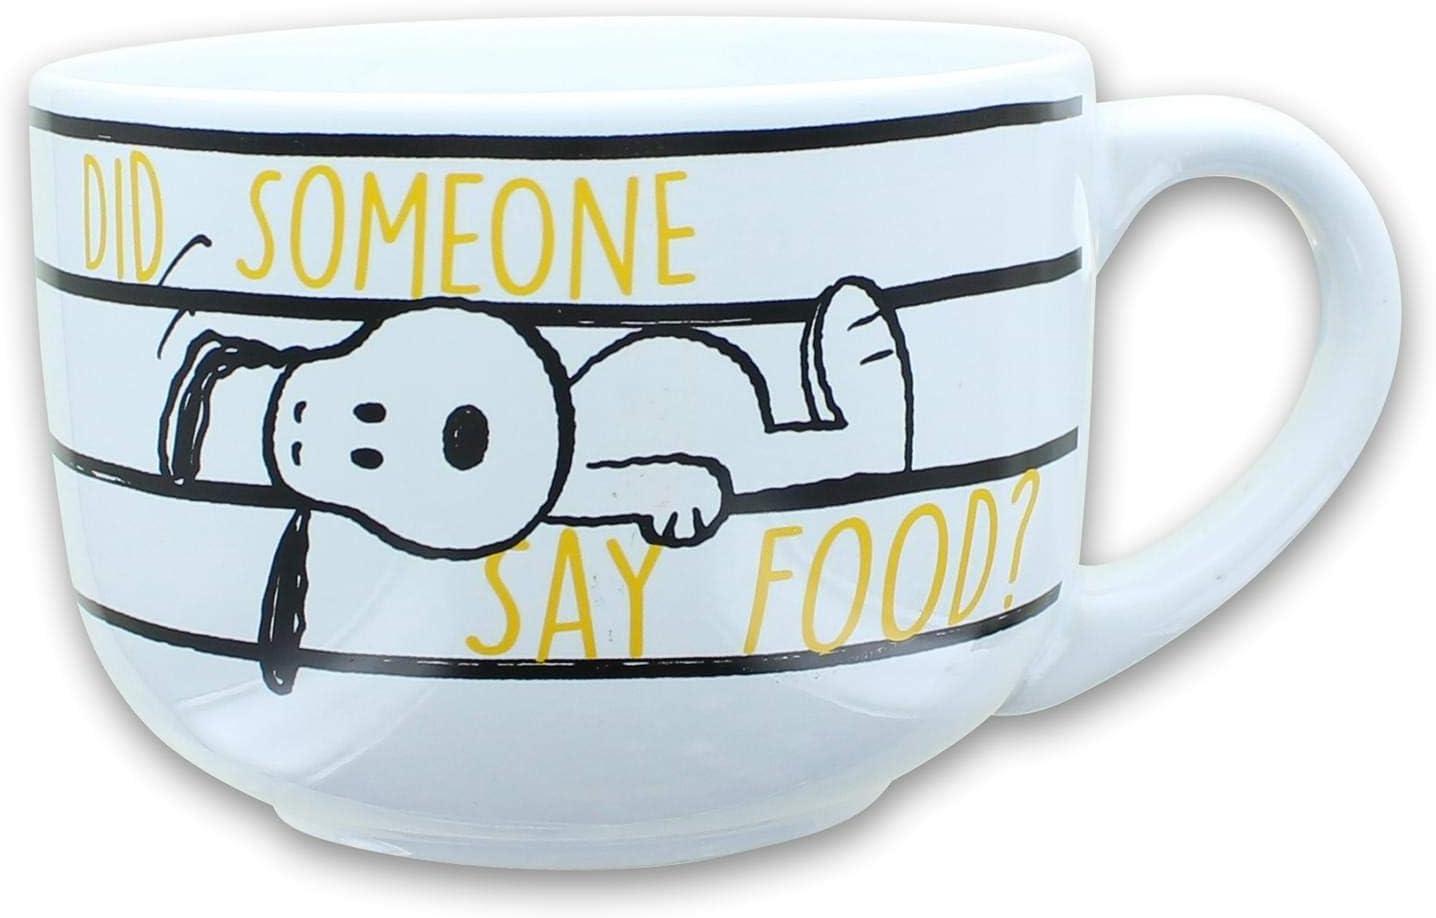 Peanuts Snoopy Did Someone Say Food 24oz Ceramic Soup Mug w/ Lid